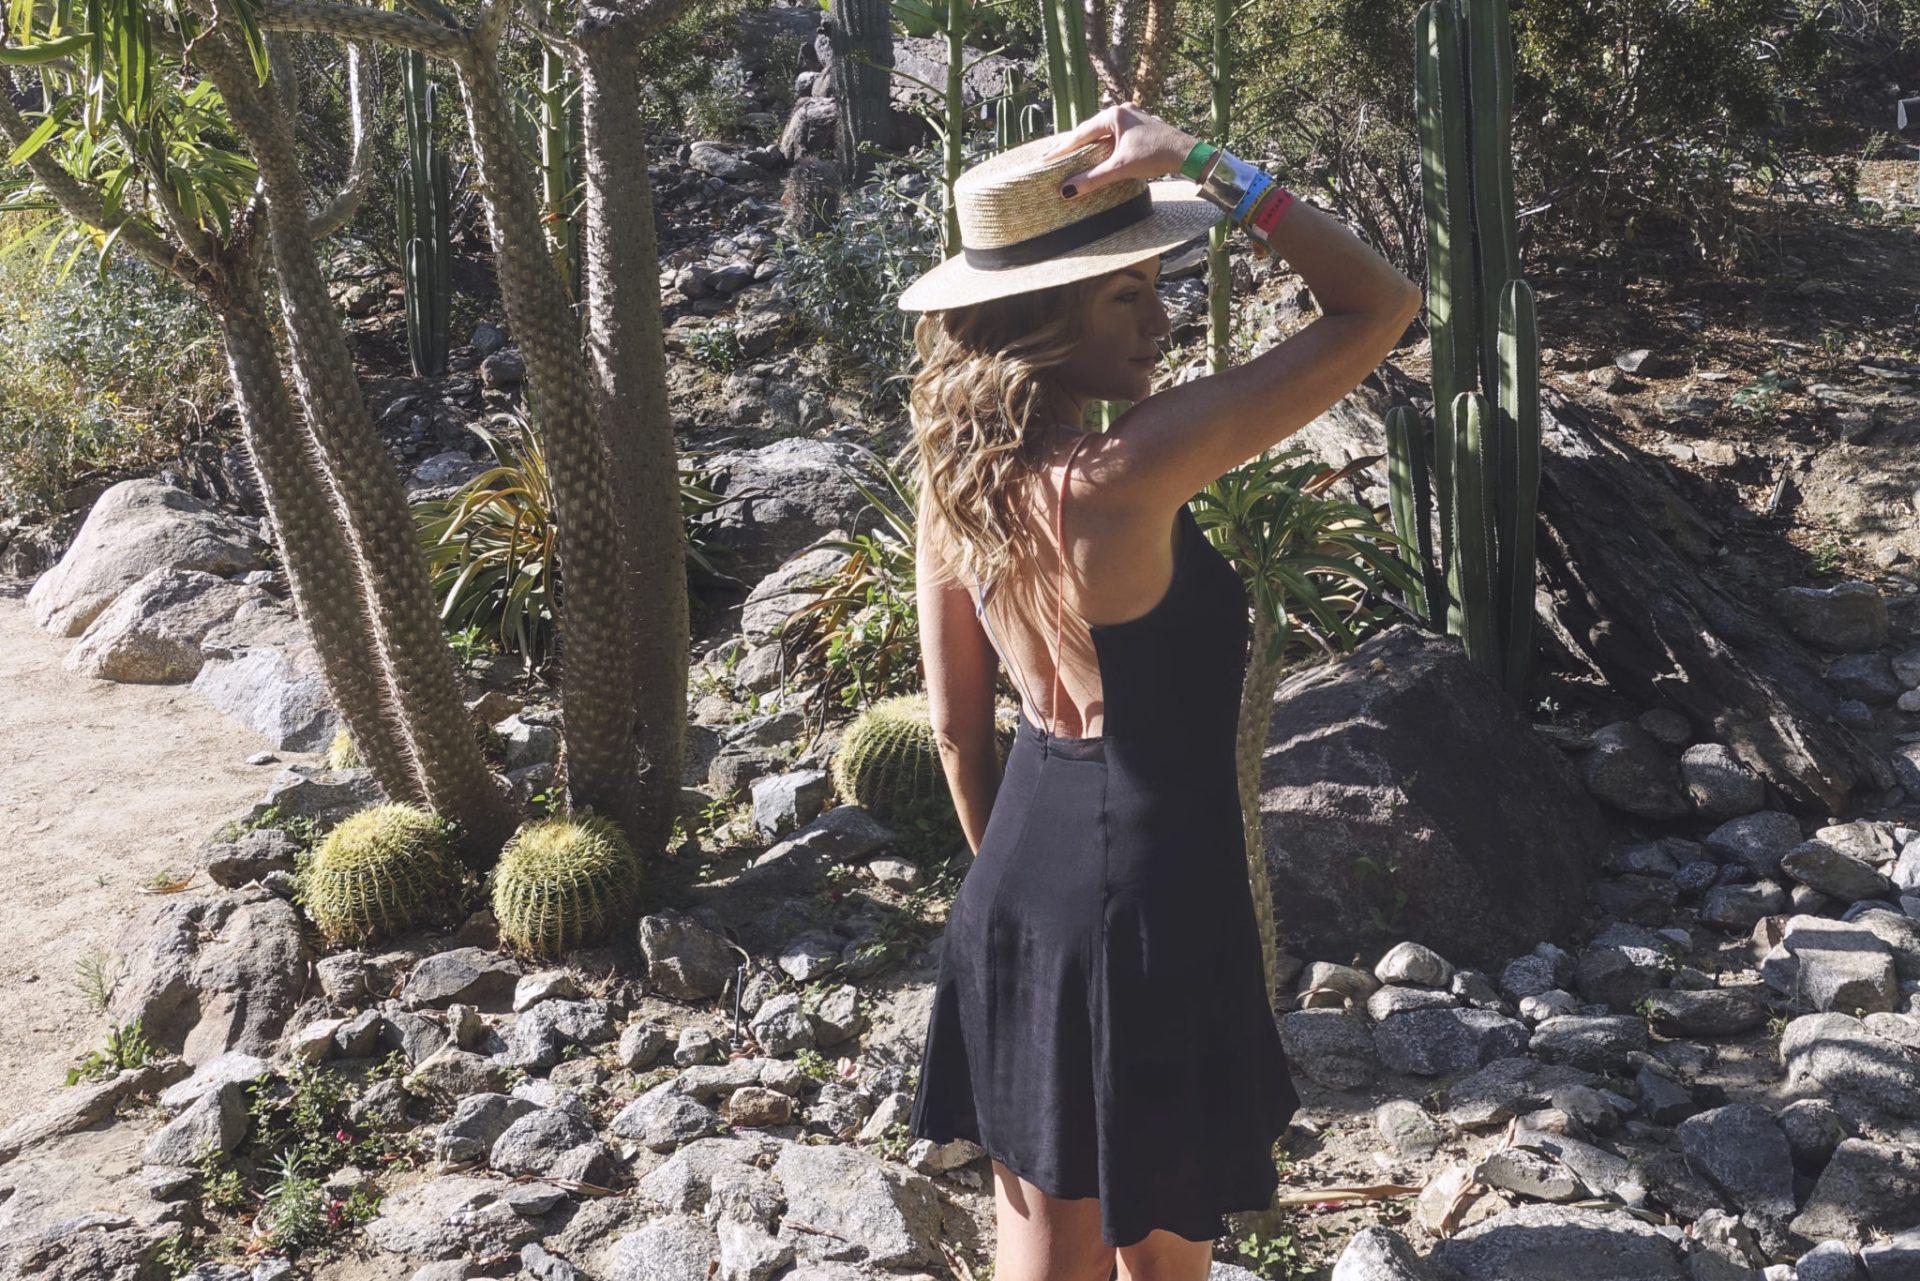 Rachel Zoe's Zoeasis in Palm Springs at Coachella